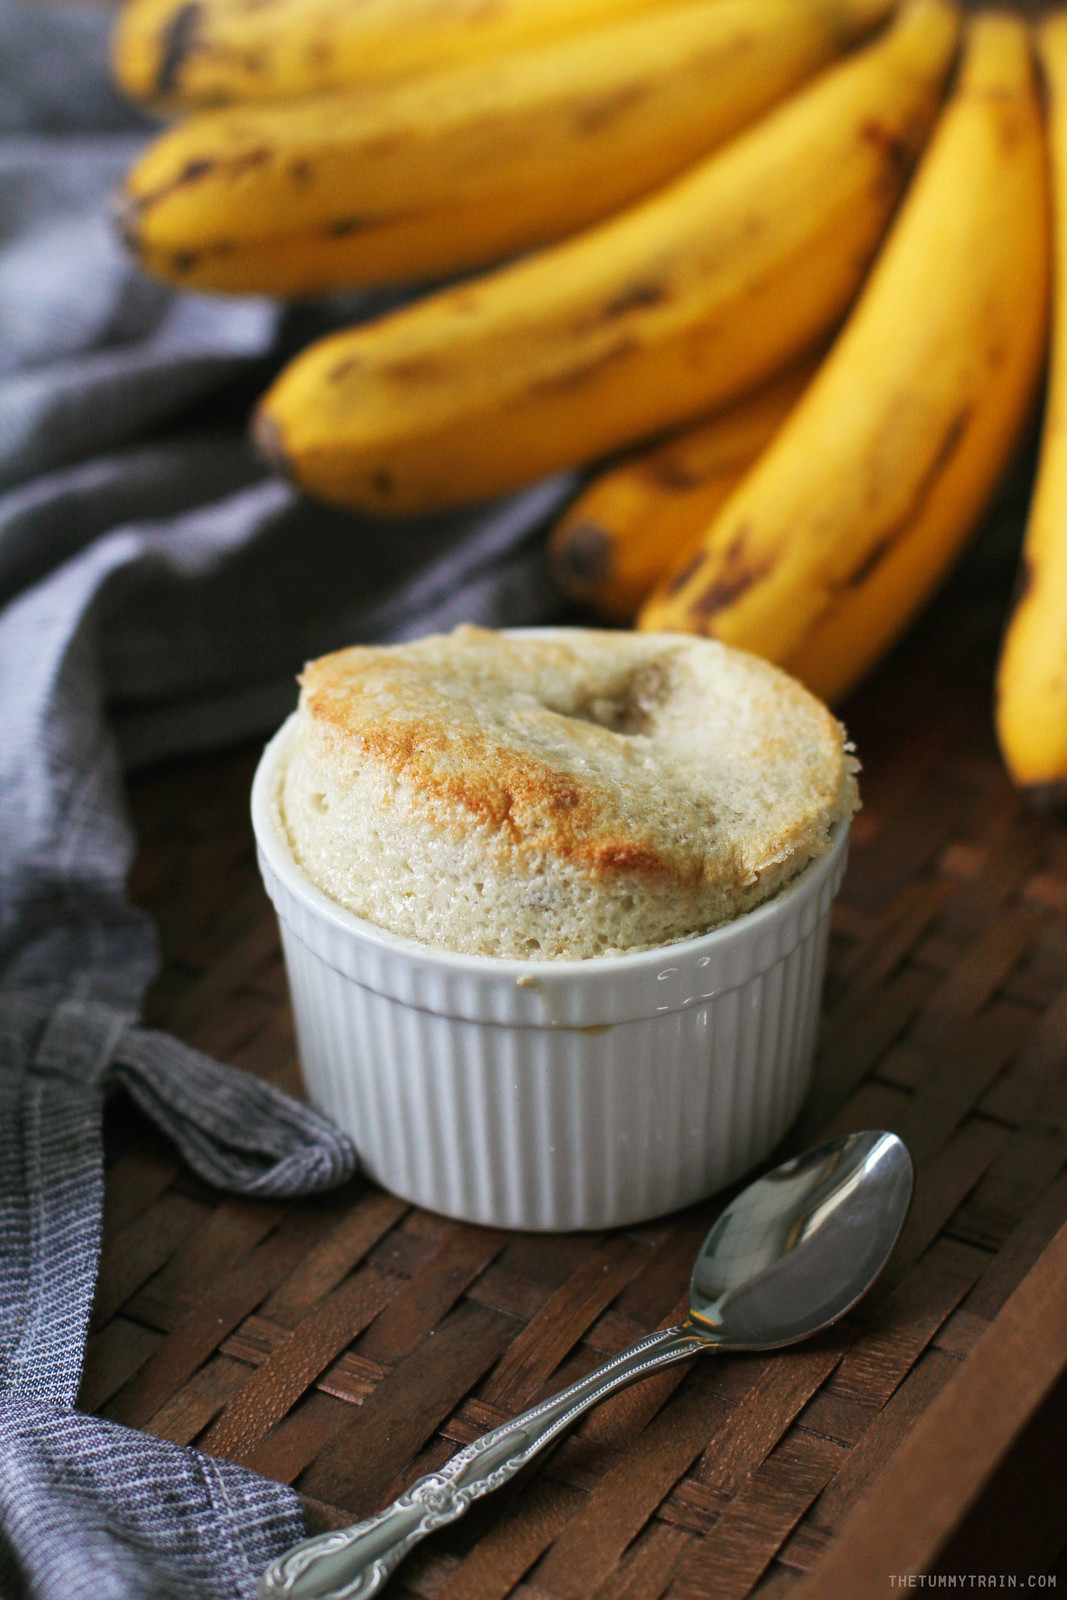 35953873420 a311df660d h - Have bananas? Make David Lebovitz's Banana Souffle!